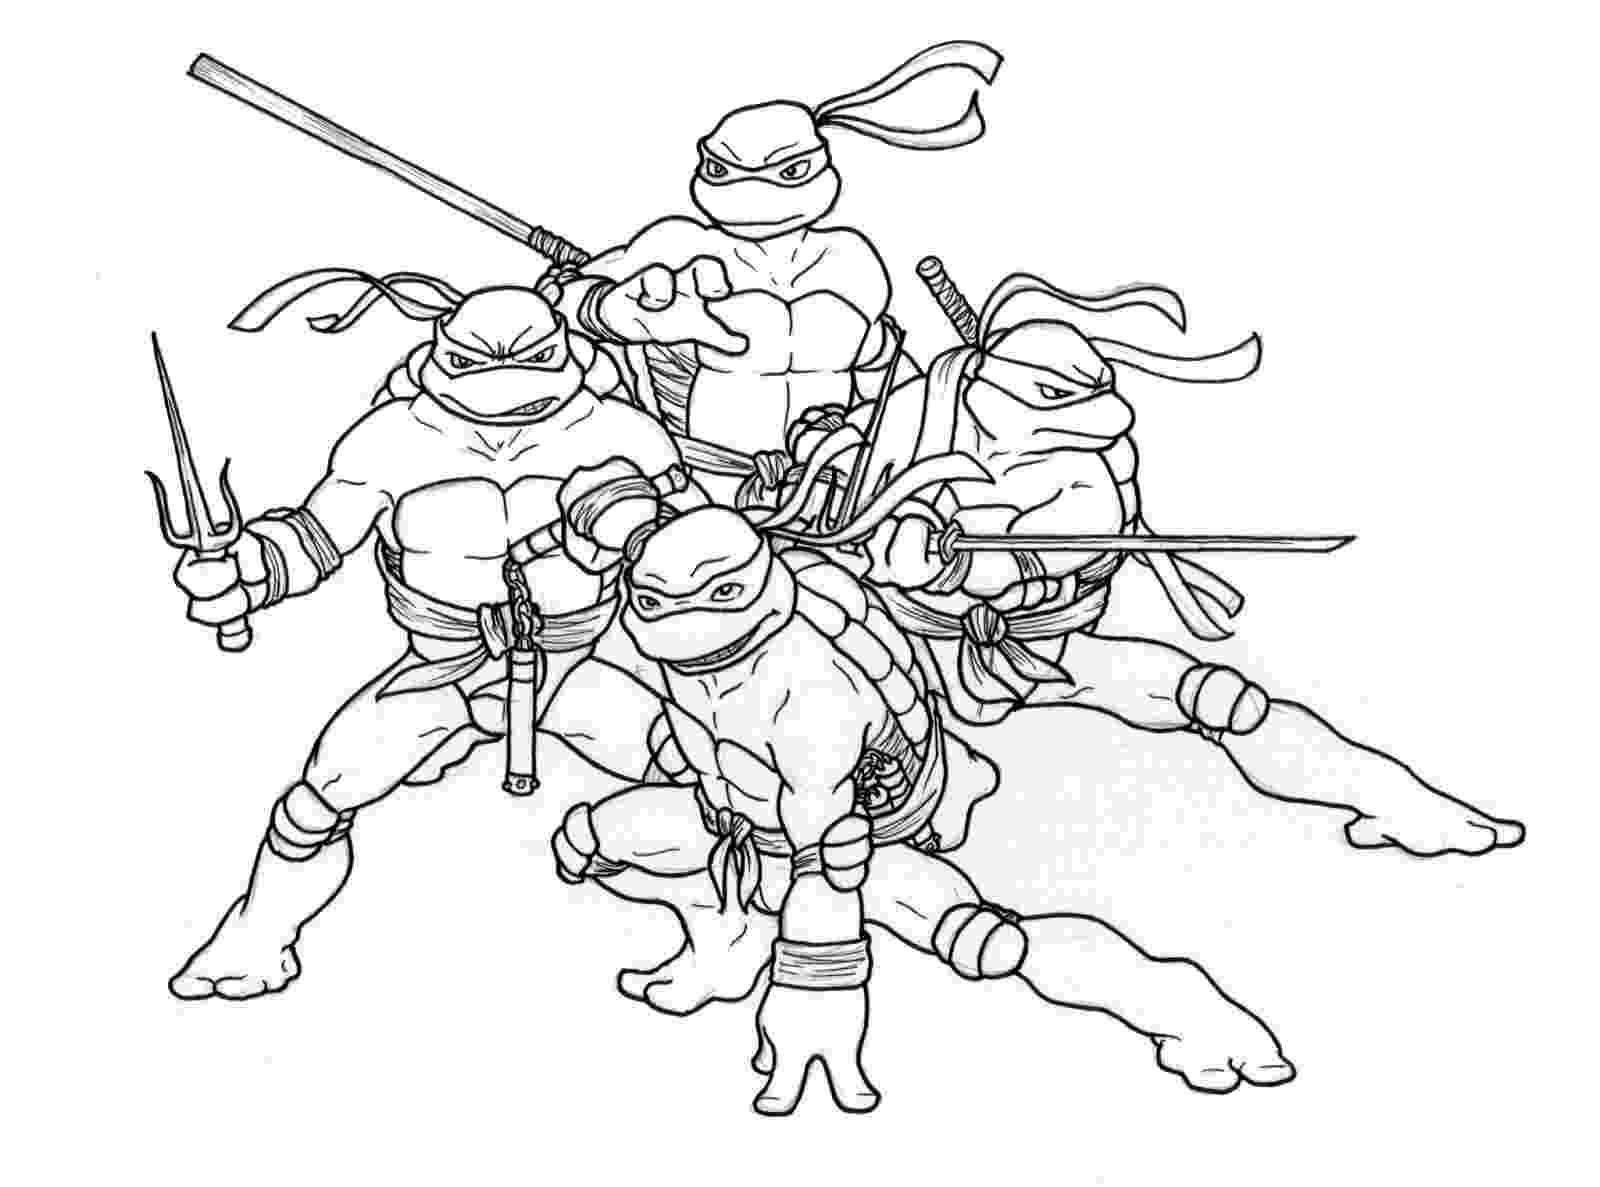 ninja turtles coloring pages printables ninja turtle coloring pages free printable pictures printables coloring turtles ninja pages